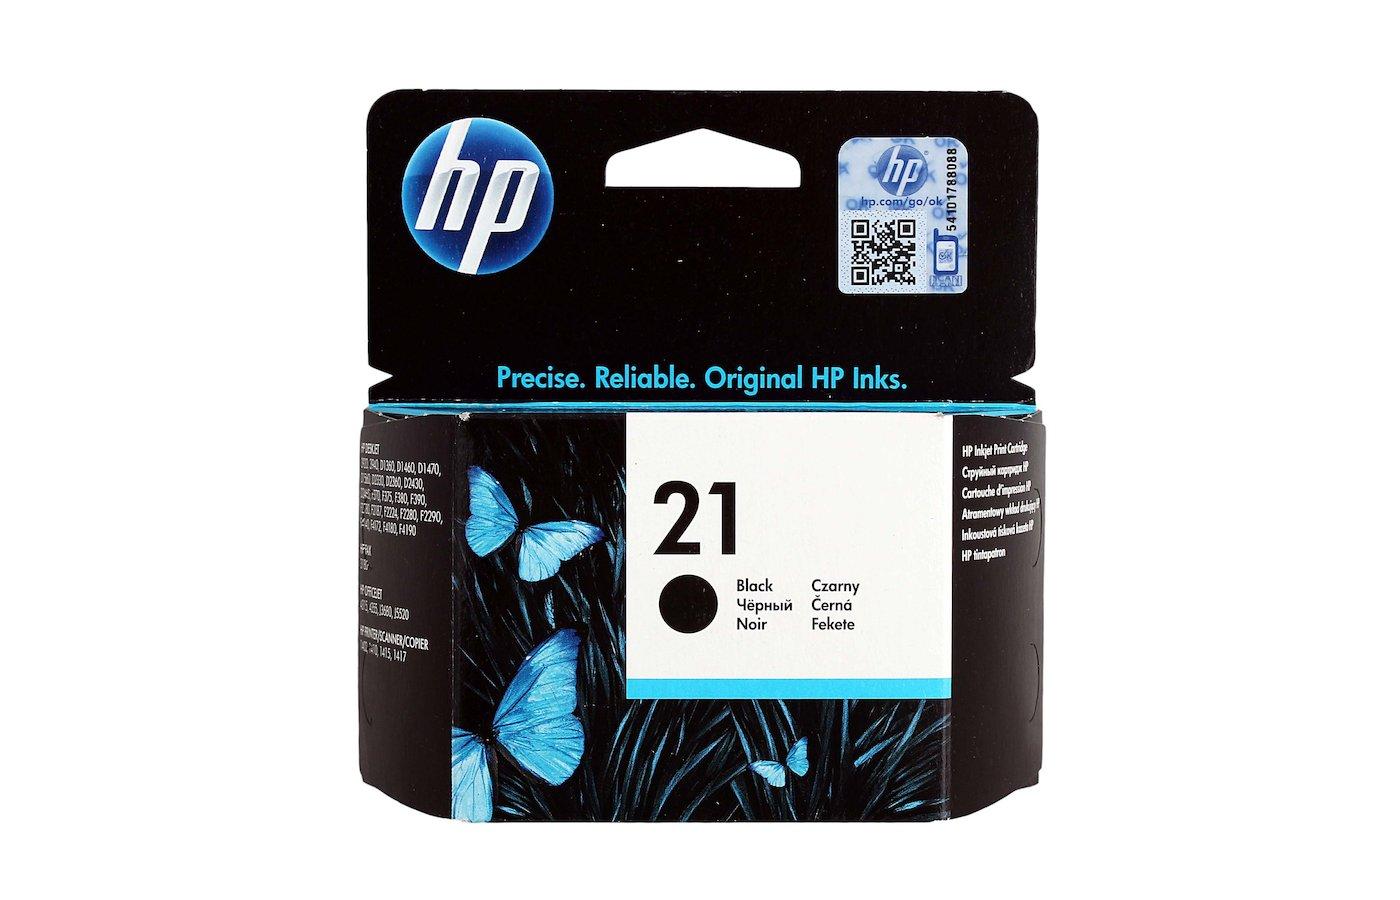 Картридж струйный HP С9351AE 21 Черный PSC 1410 Deskjet 3920/3940 (C9351AE ORIG)